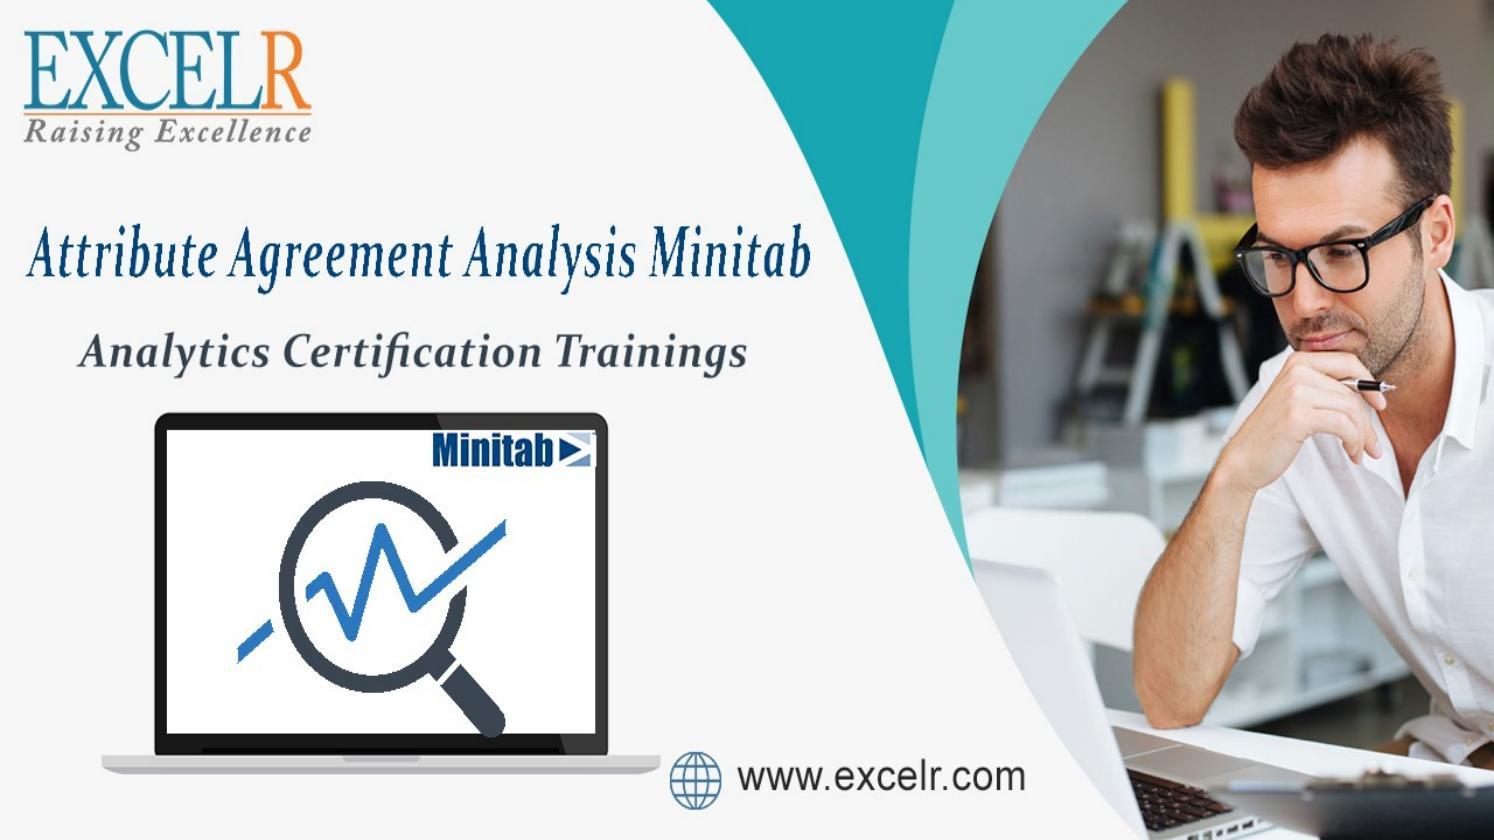 Attribute Agreement Analysis In Minitab Case Study On Attribute